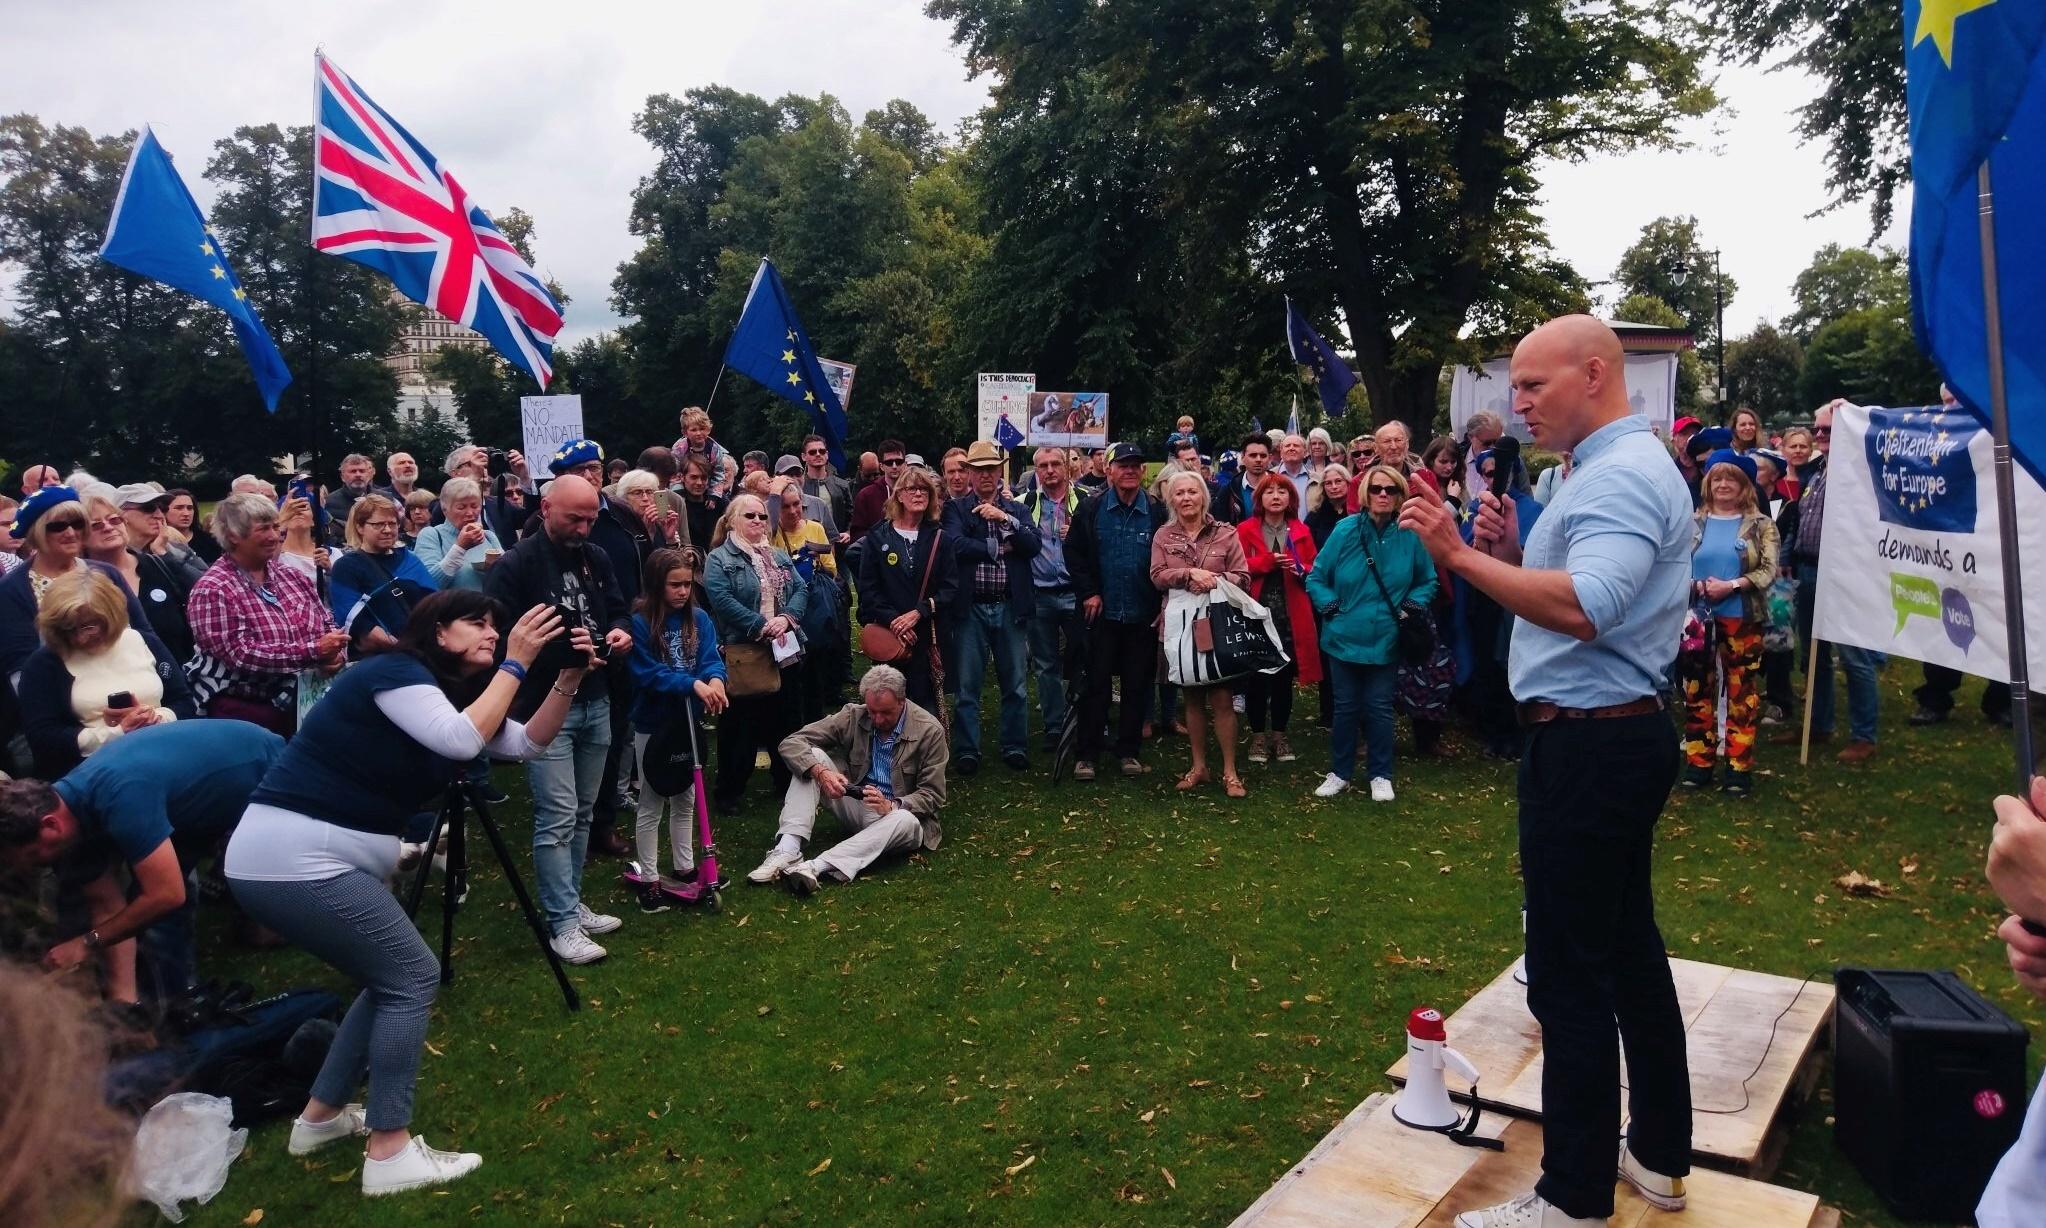 Max tells pro-EU rally: 'Vote Lib Dem to stop Brexit'